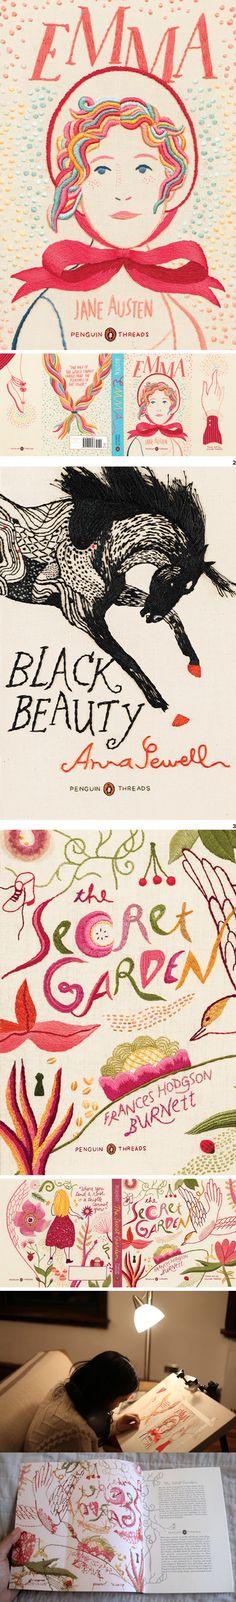 A bonus interview with Penguin Books Art Director Paul Buckley and Illustrator Jillian Tamaki.